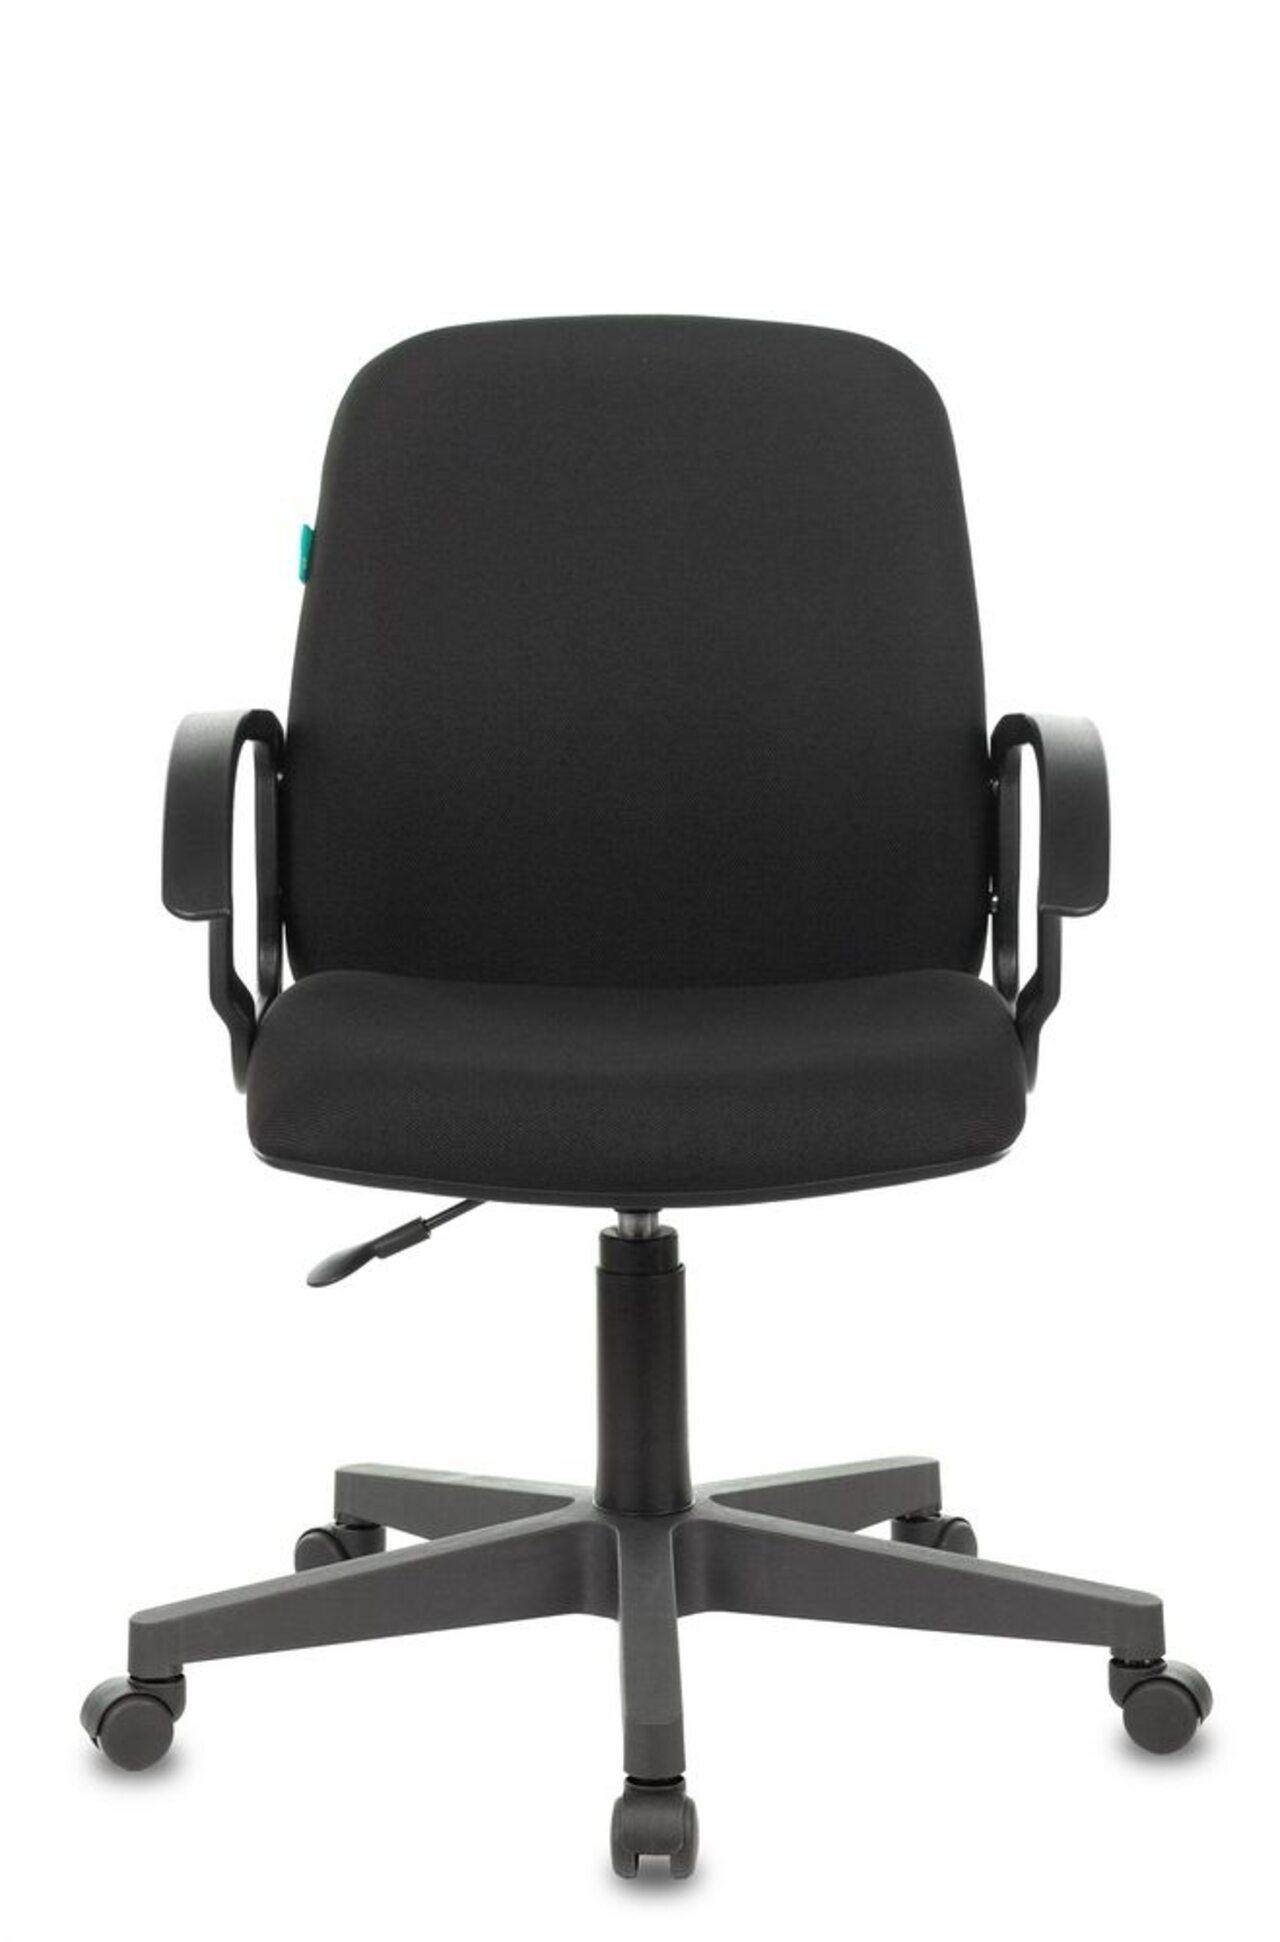 Кресло для персонала CH-808-LOW - фото 5